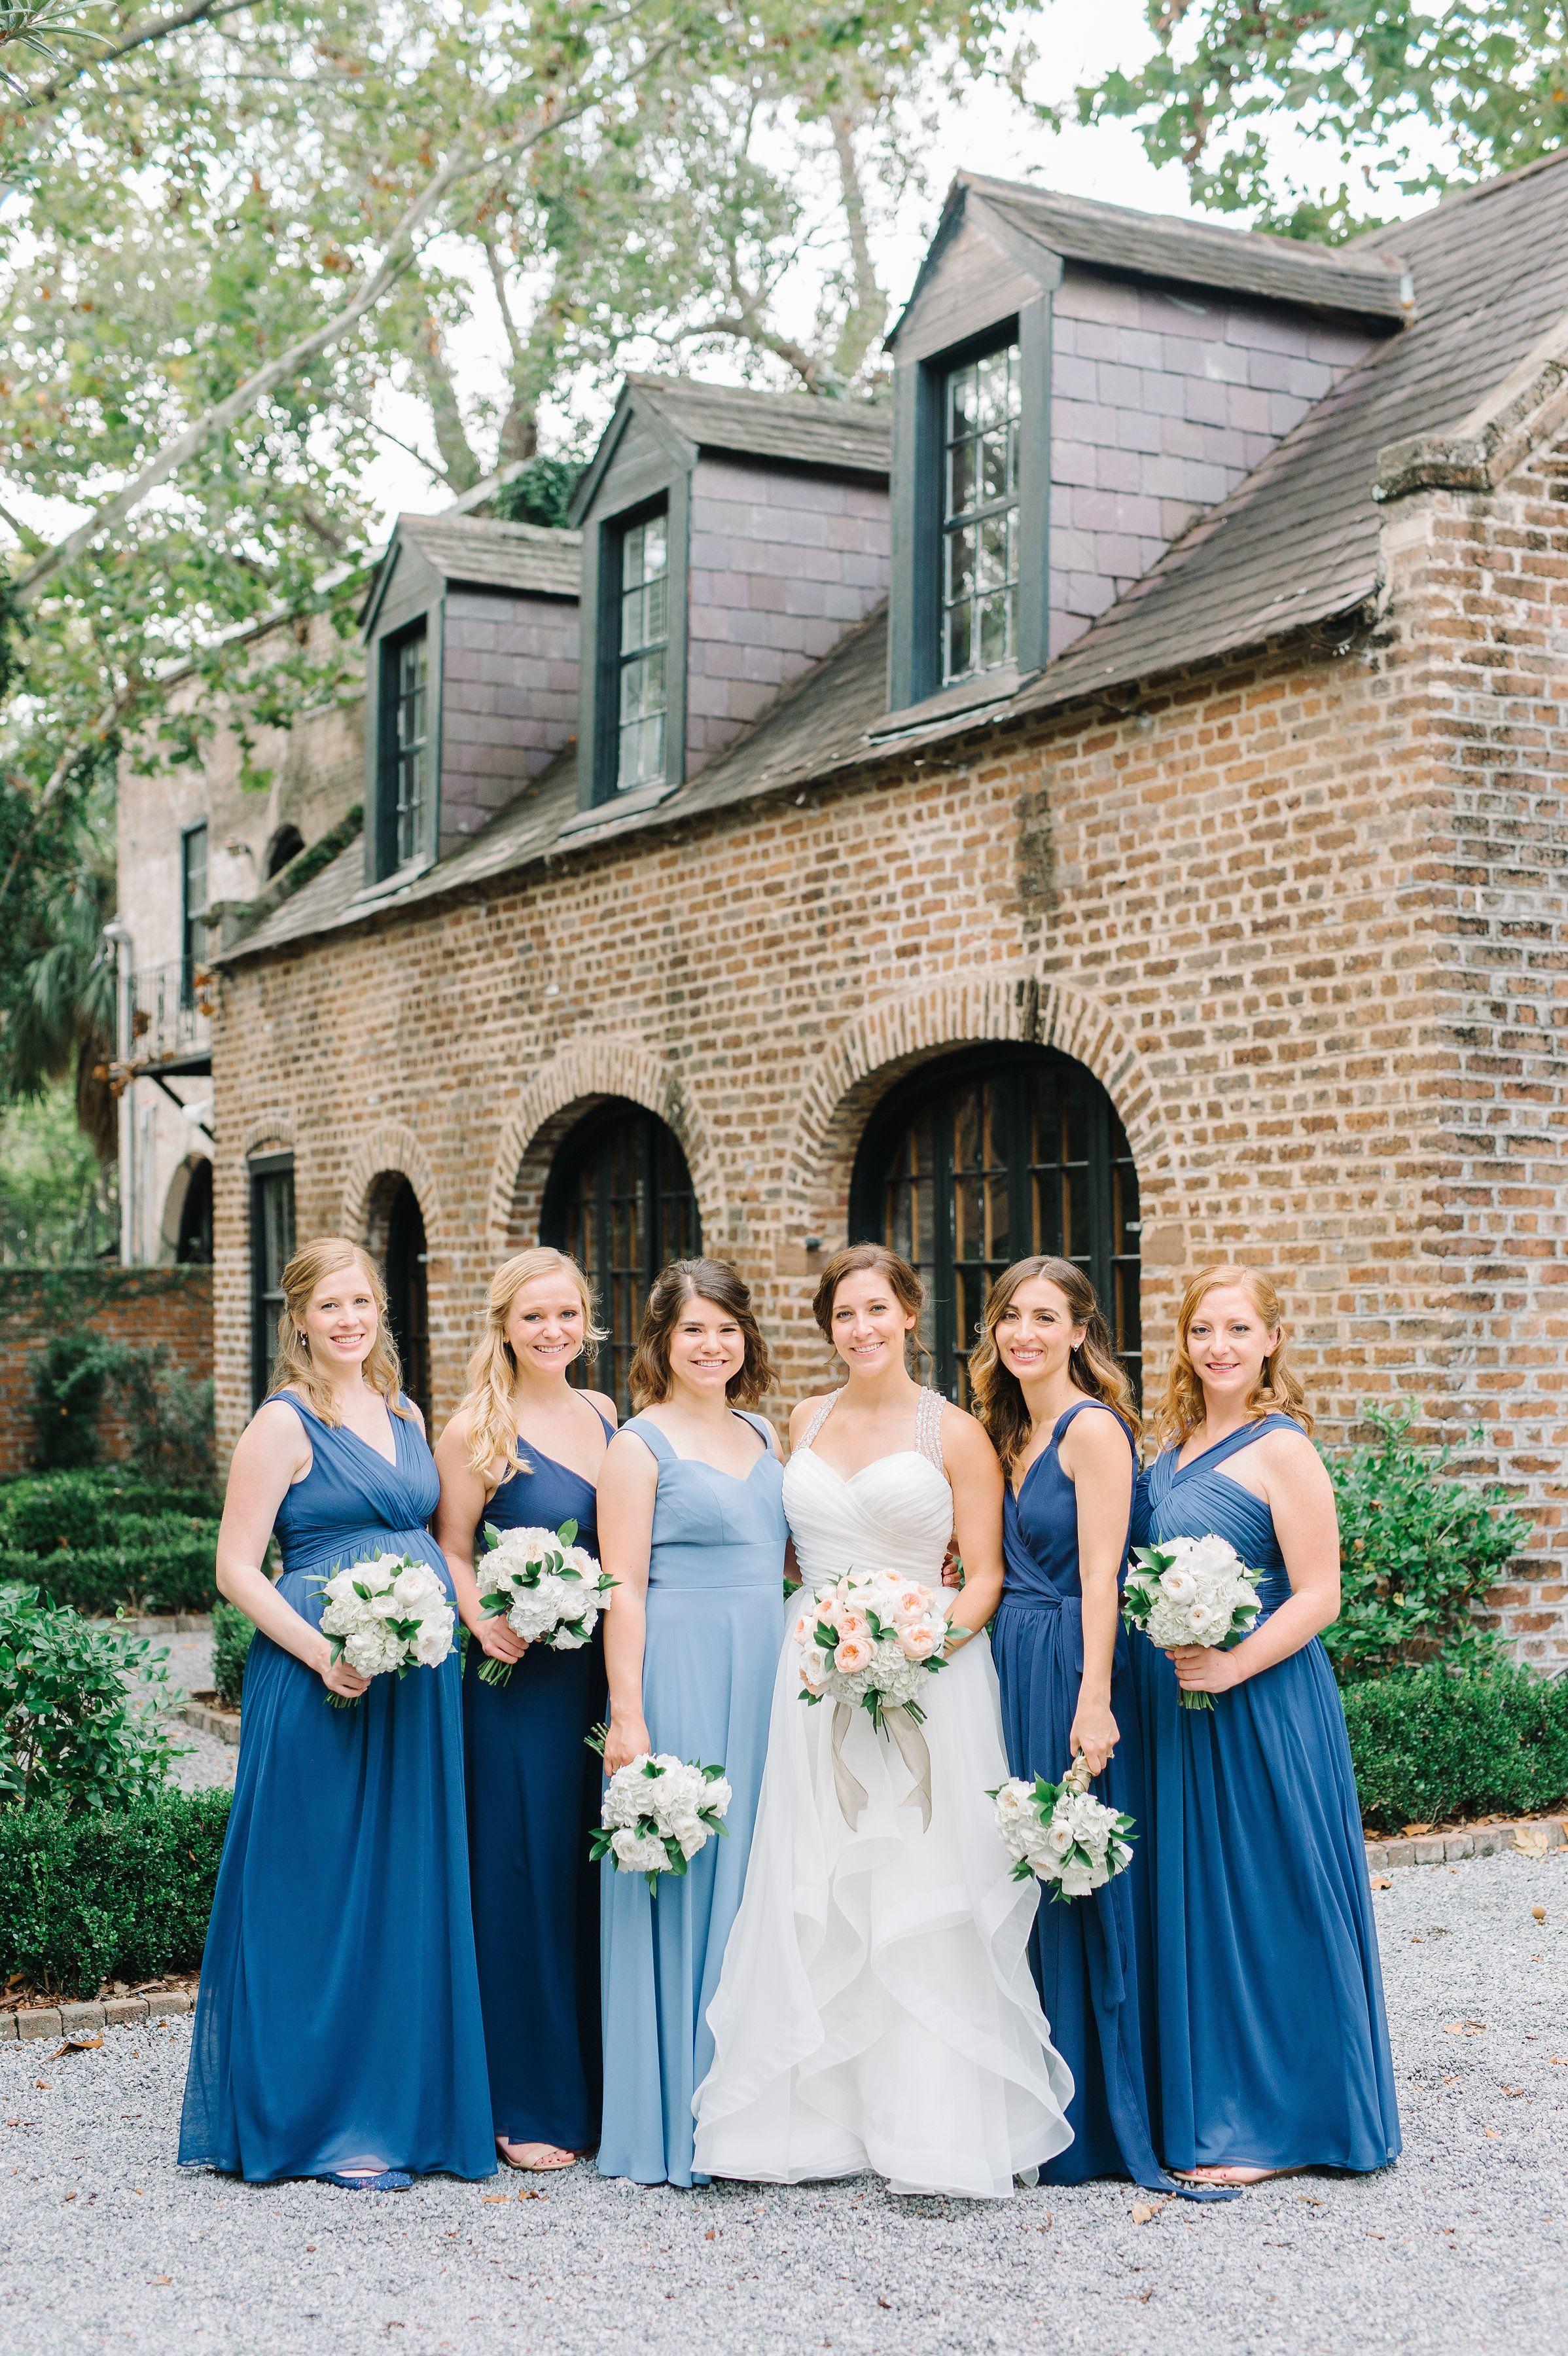 Blue bridesmaids dresses lowndes grove nautical wedding pure blue bridesmaids dresses lowndes grove nautical wedding ombrellifo Choice Image